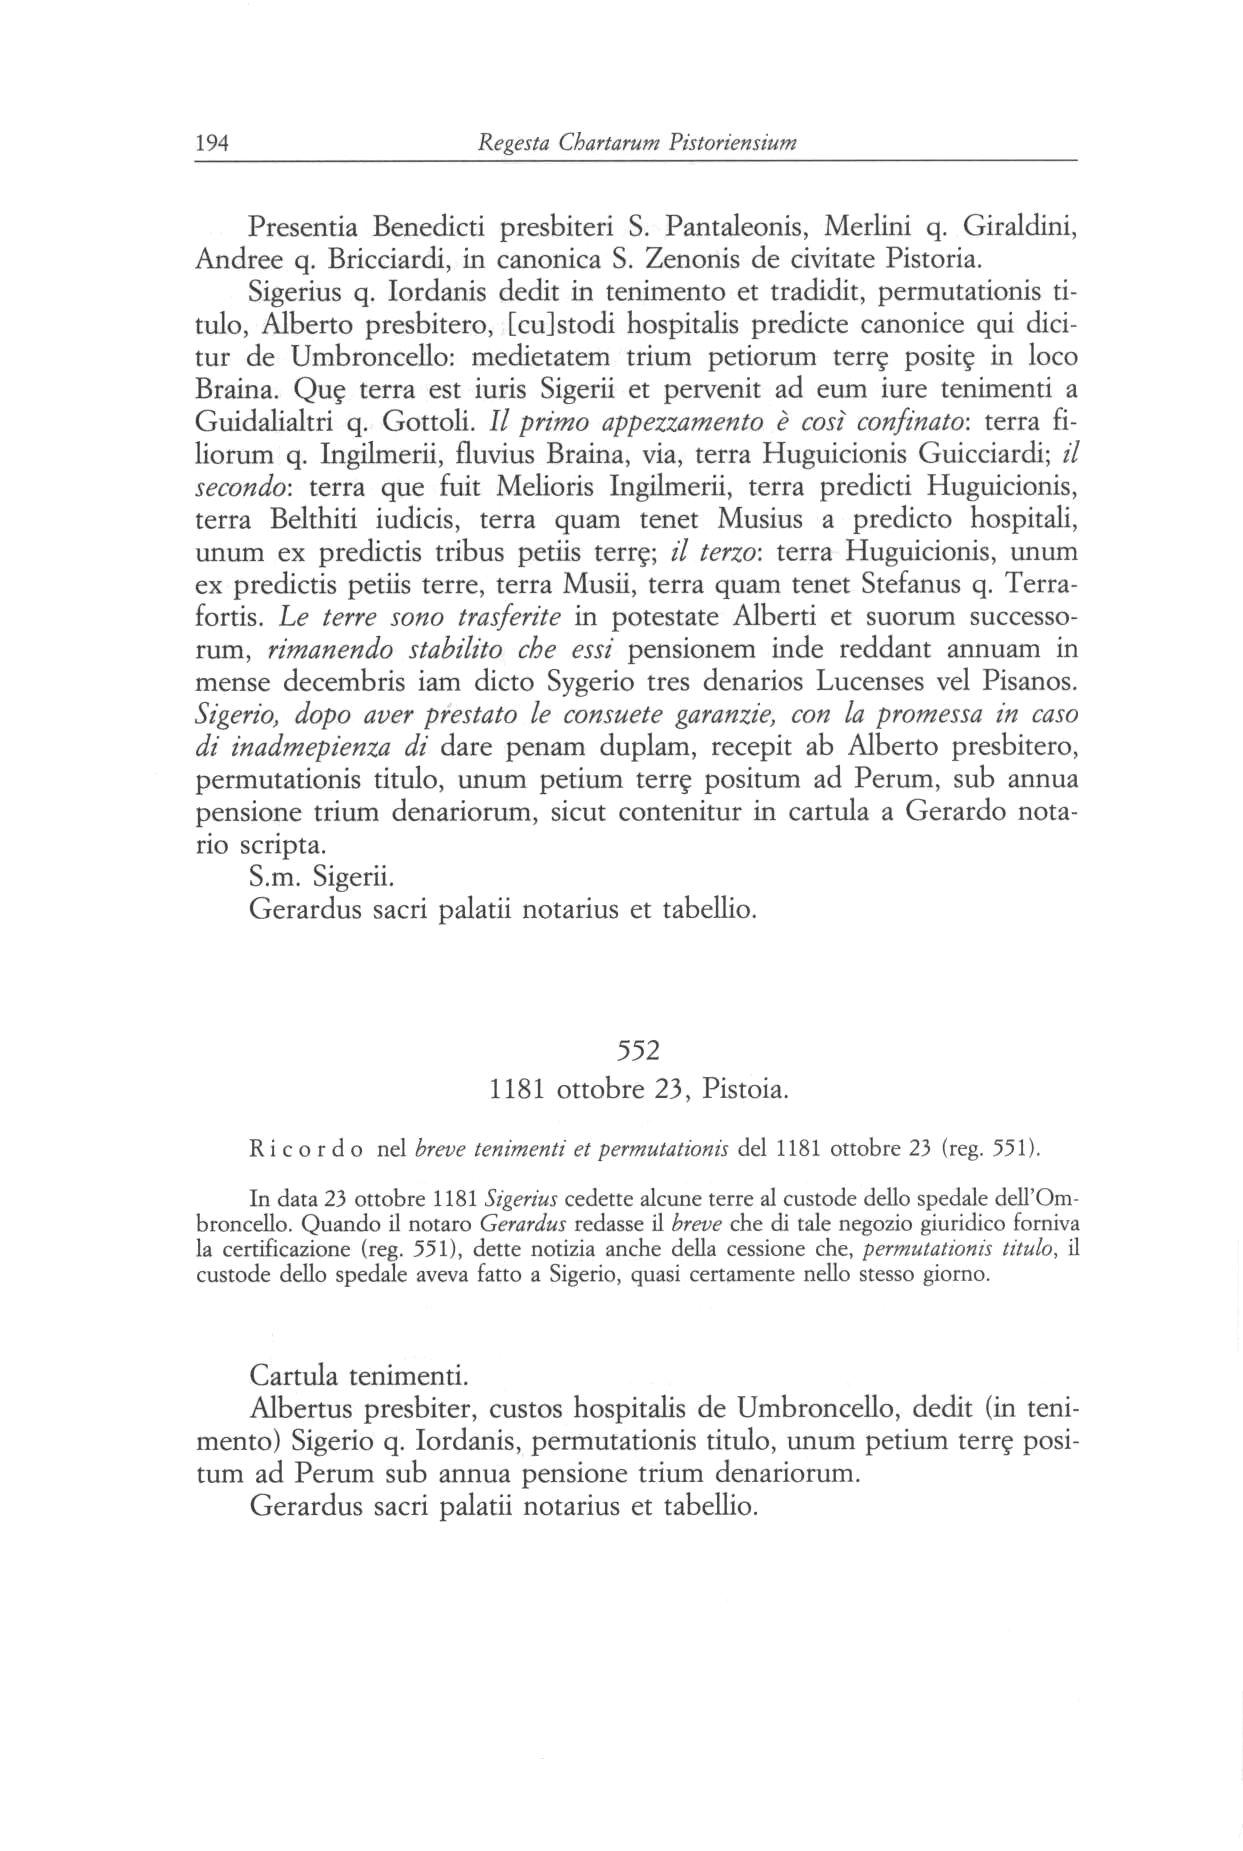 Canonica S. Zenone XII 0194.jpg